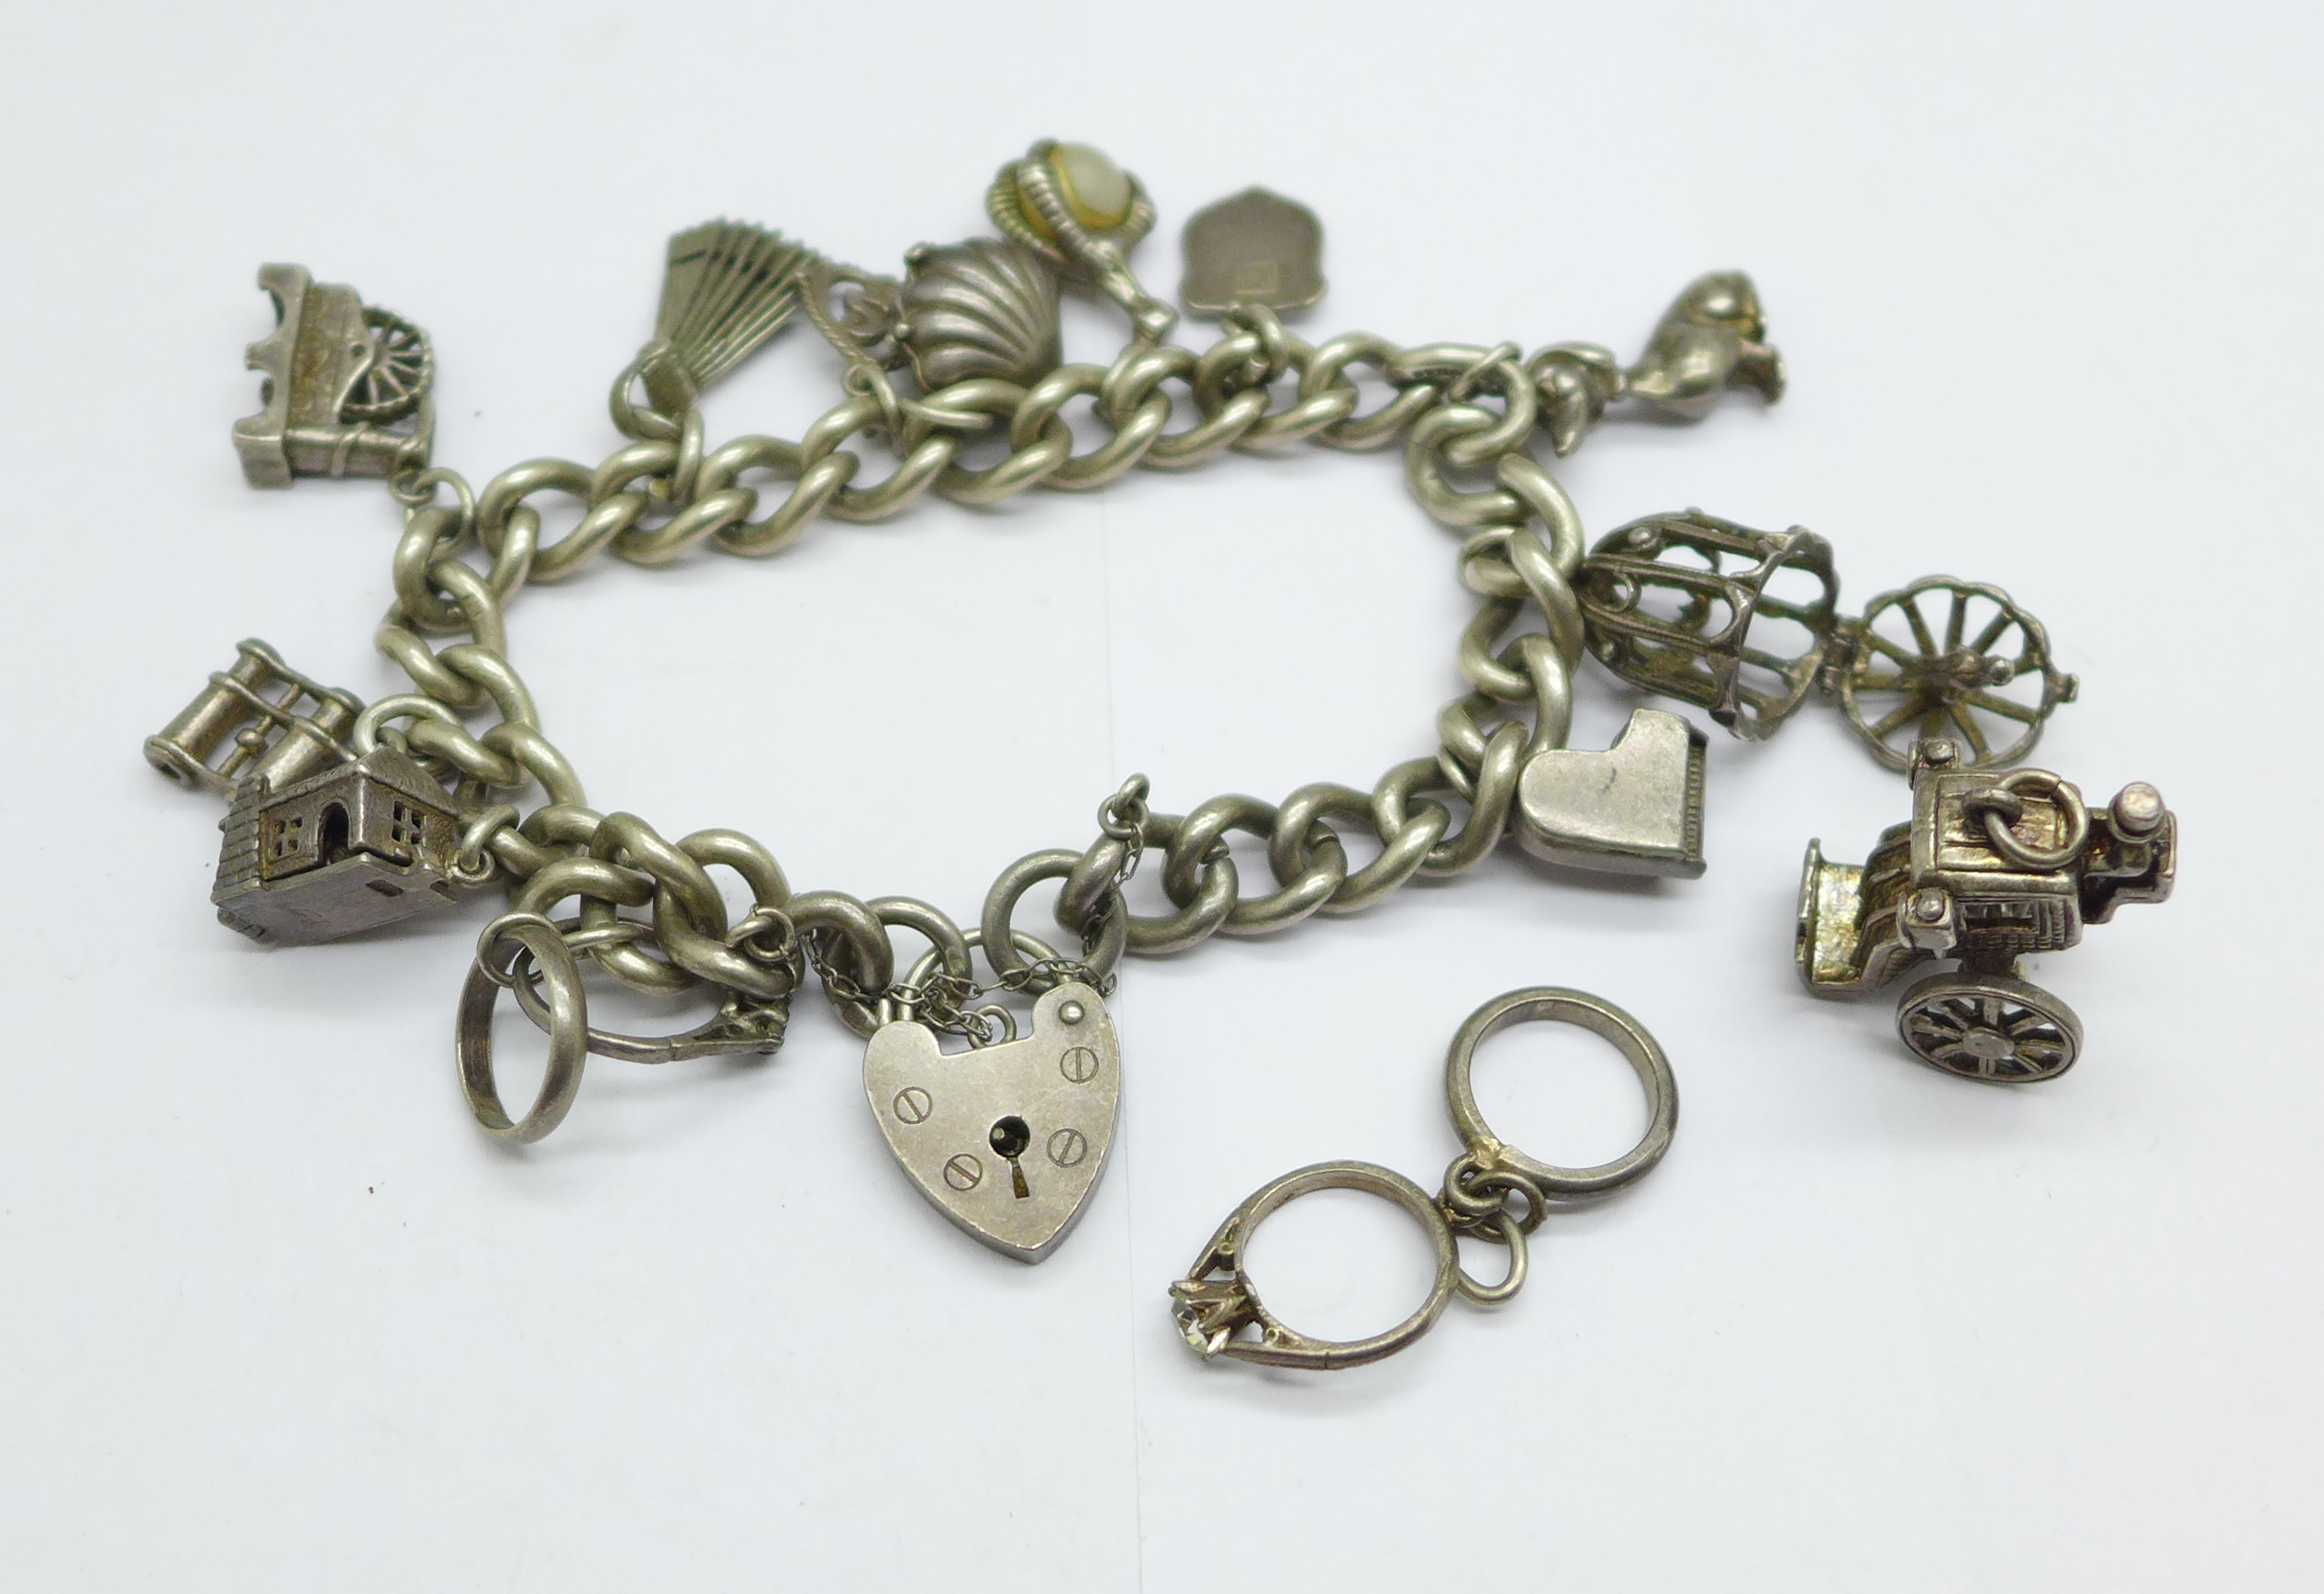 A silver charm bracelet, 68g